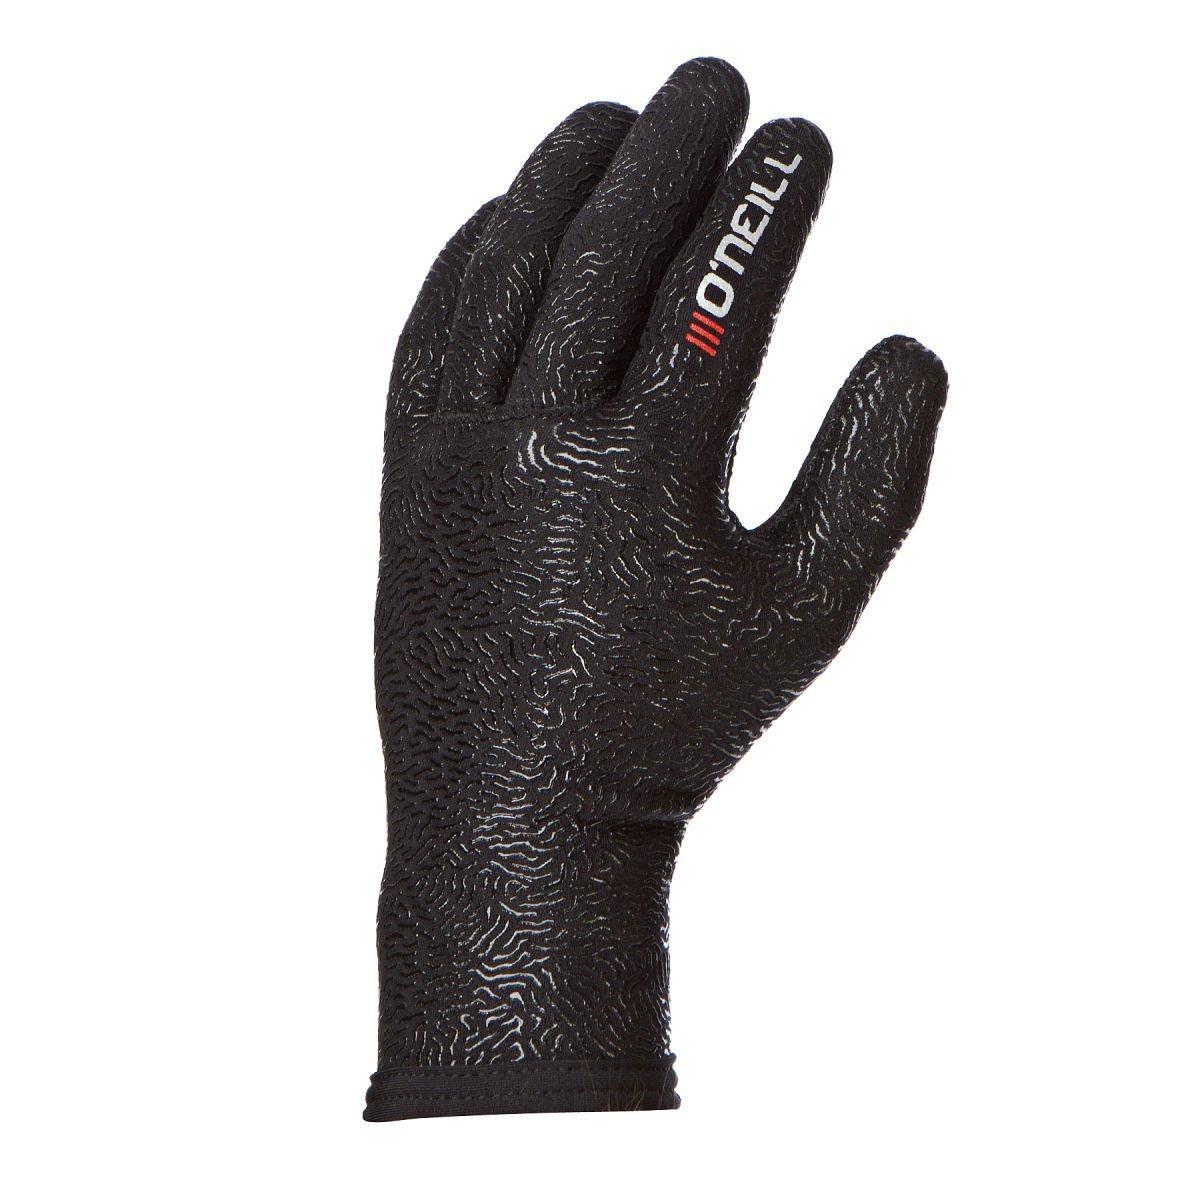 Bekleidung Angelsport Greys Neoprene Gloves Neoprenhandschuhe Handschuhe aus Neopren Handschuh